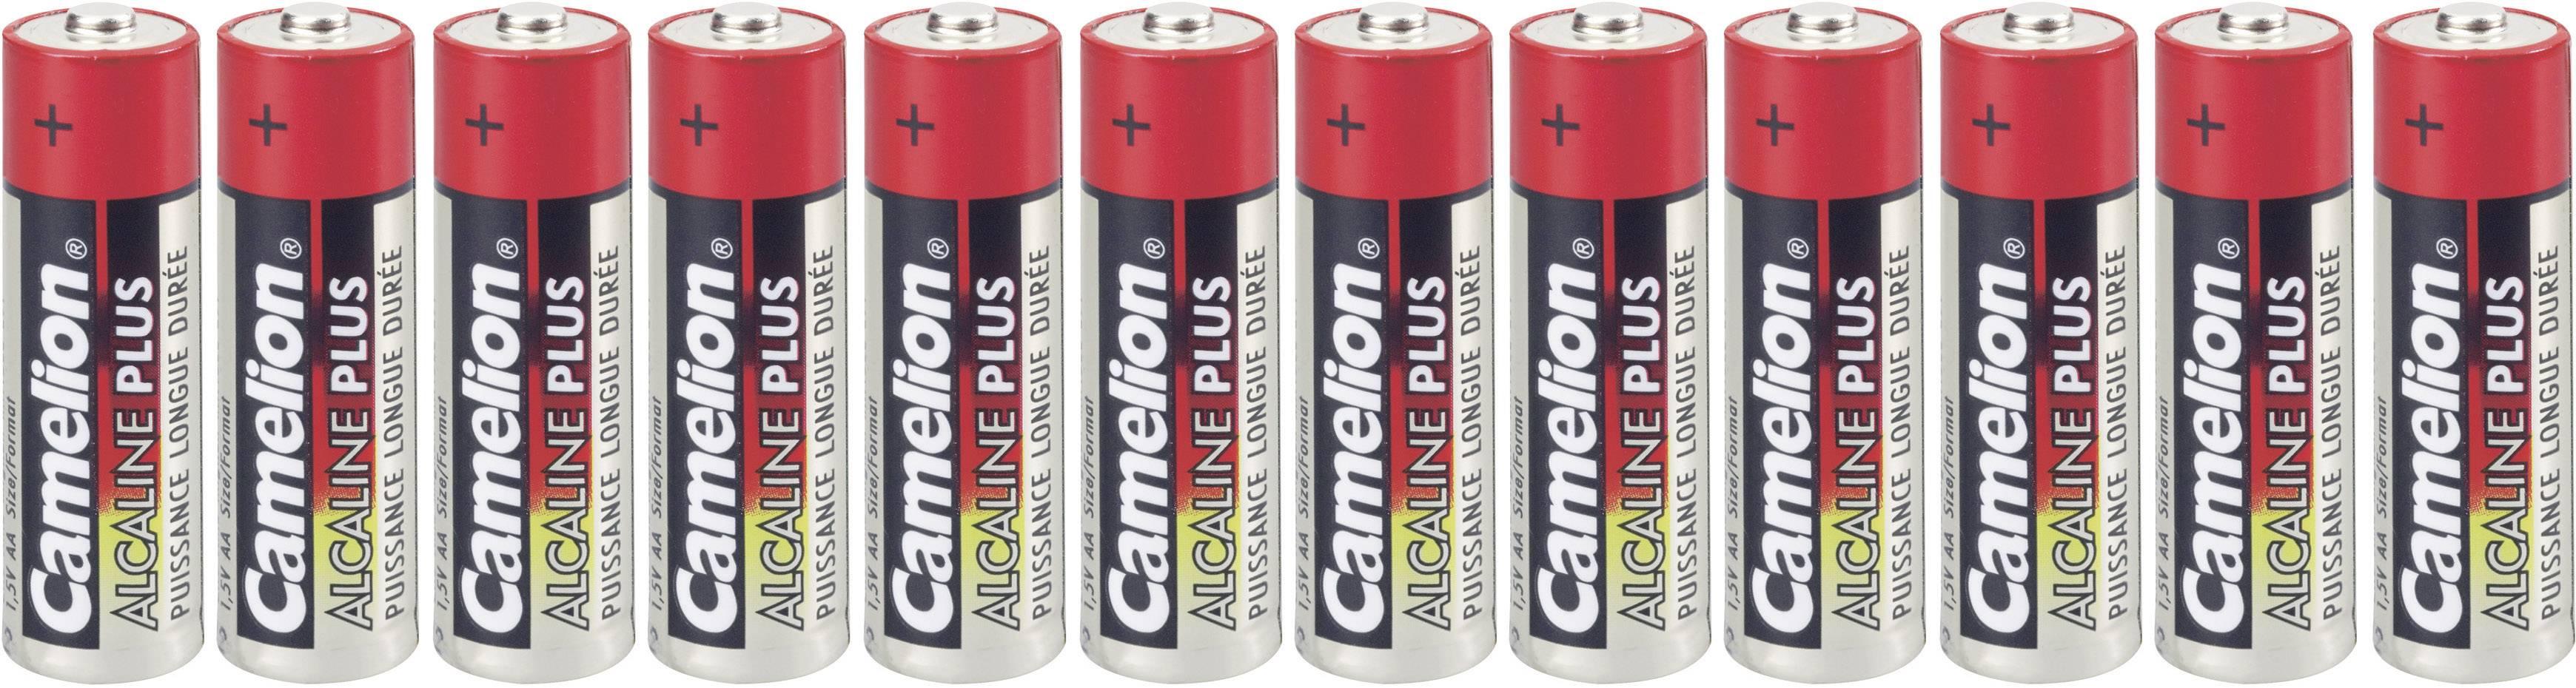 Tužková batéria typu AA alkalicko/mangánová Camelion Plus LR06, 2800 mAh, 1.5 V, 12 ks